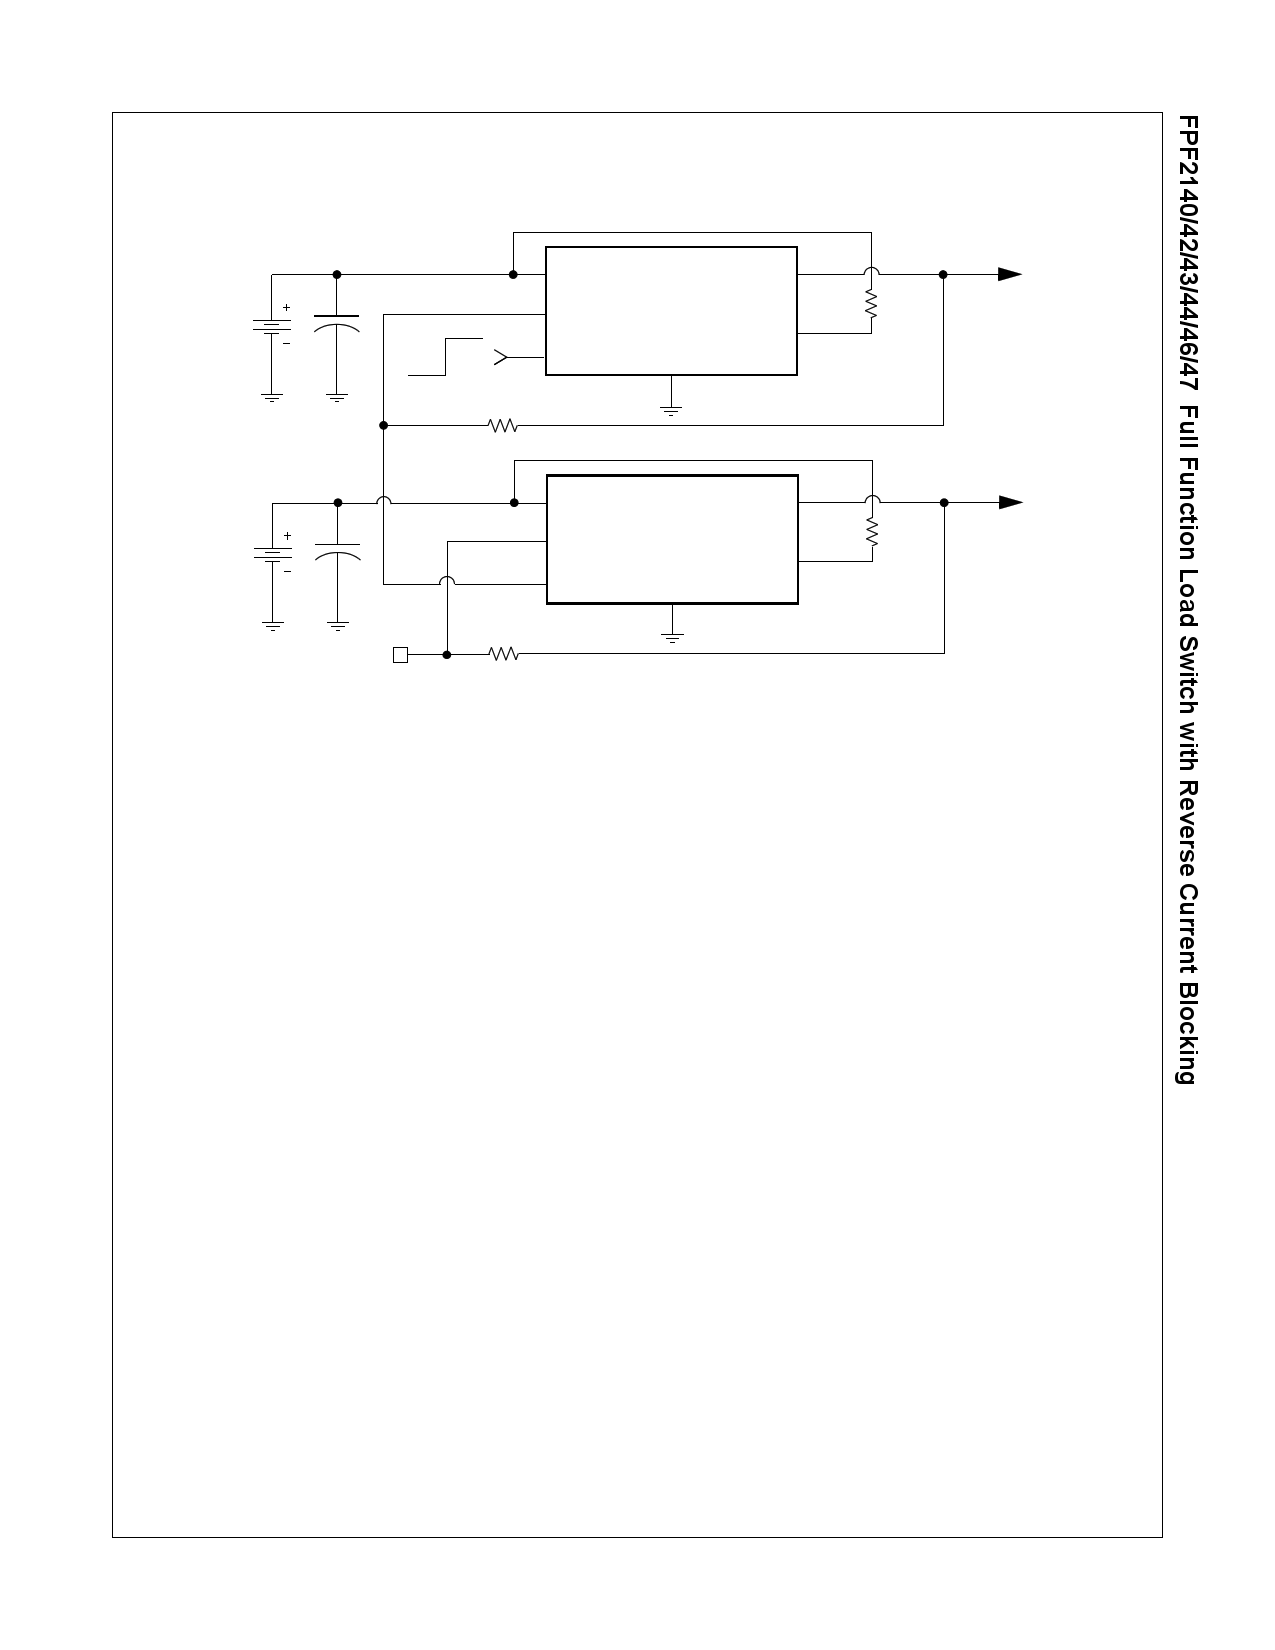 FPF2147 arduino